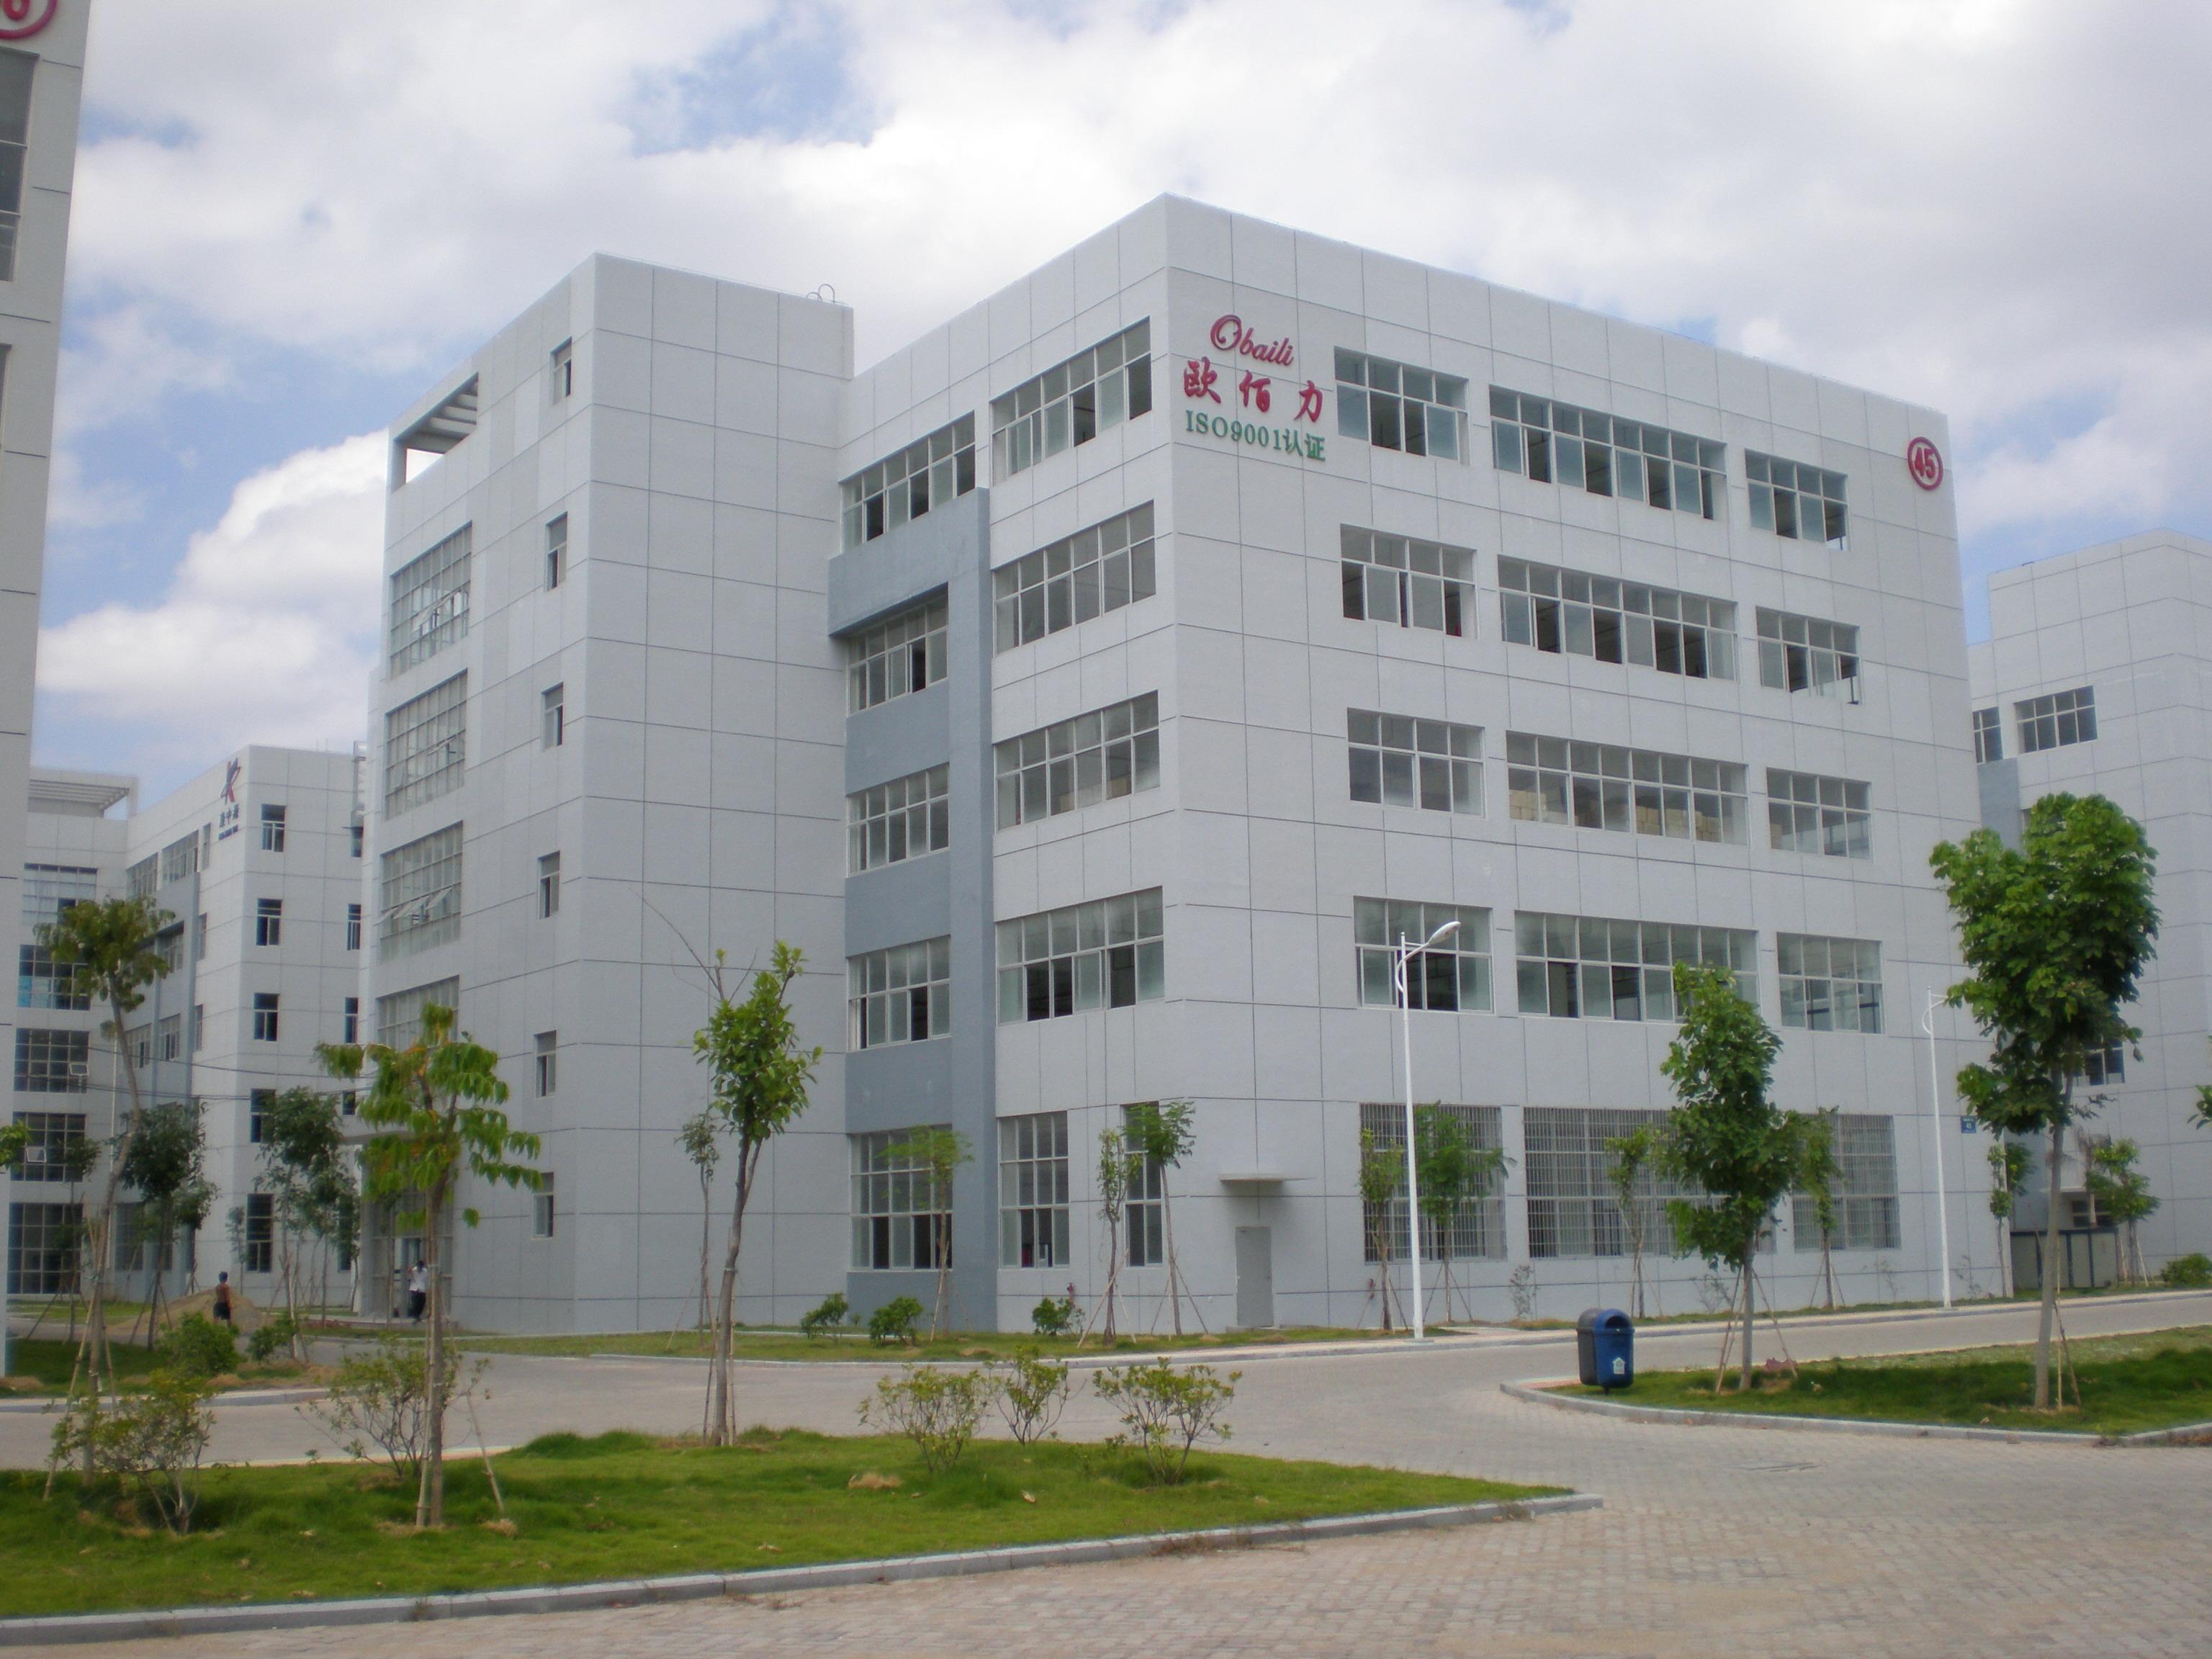 Obaili factory building